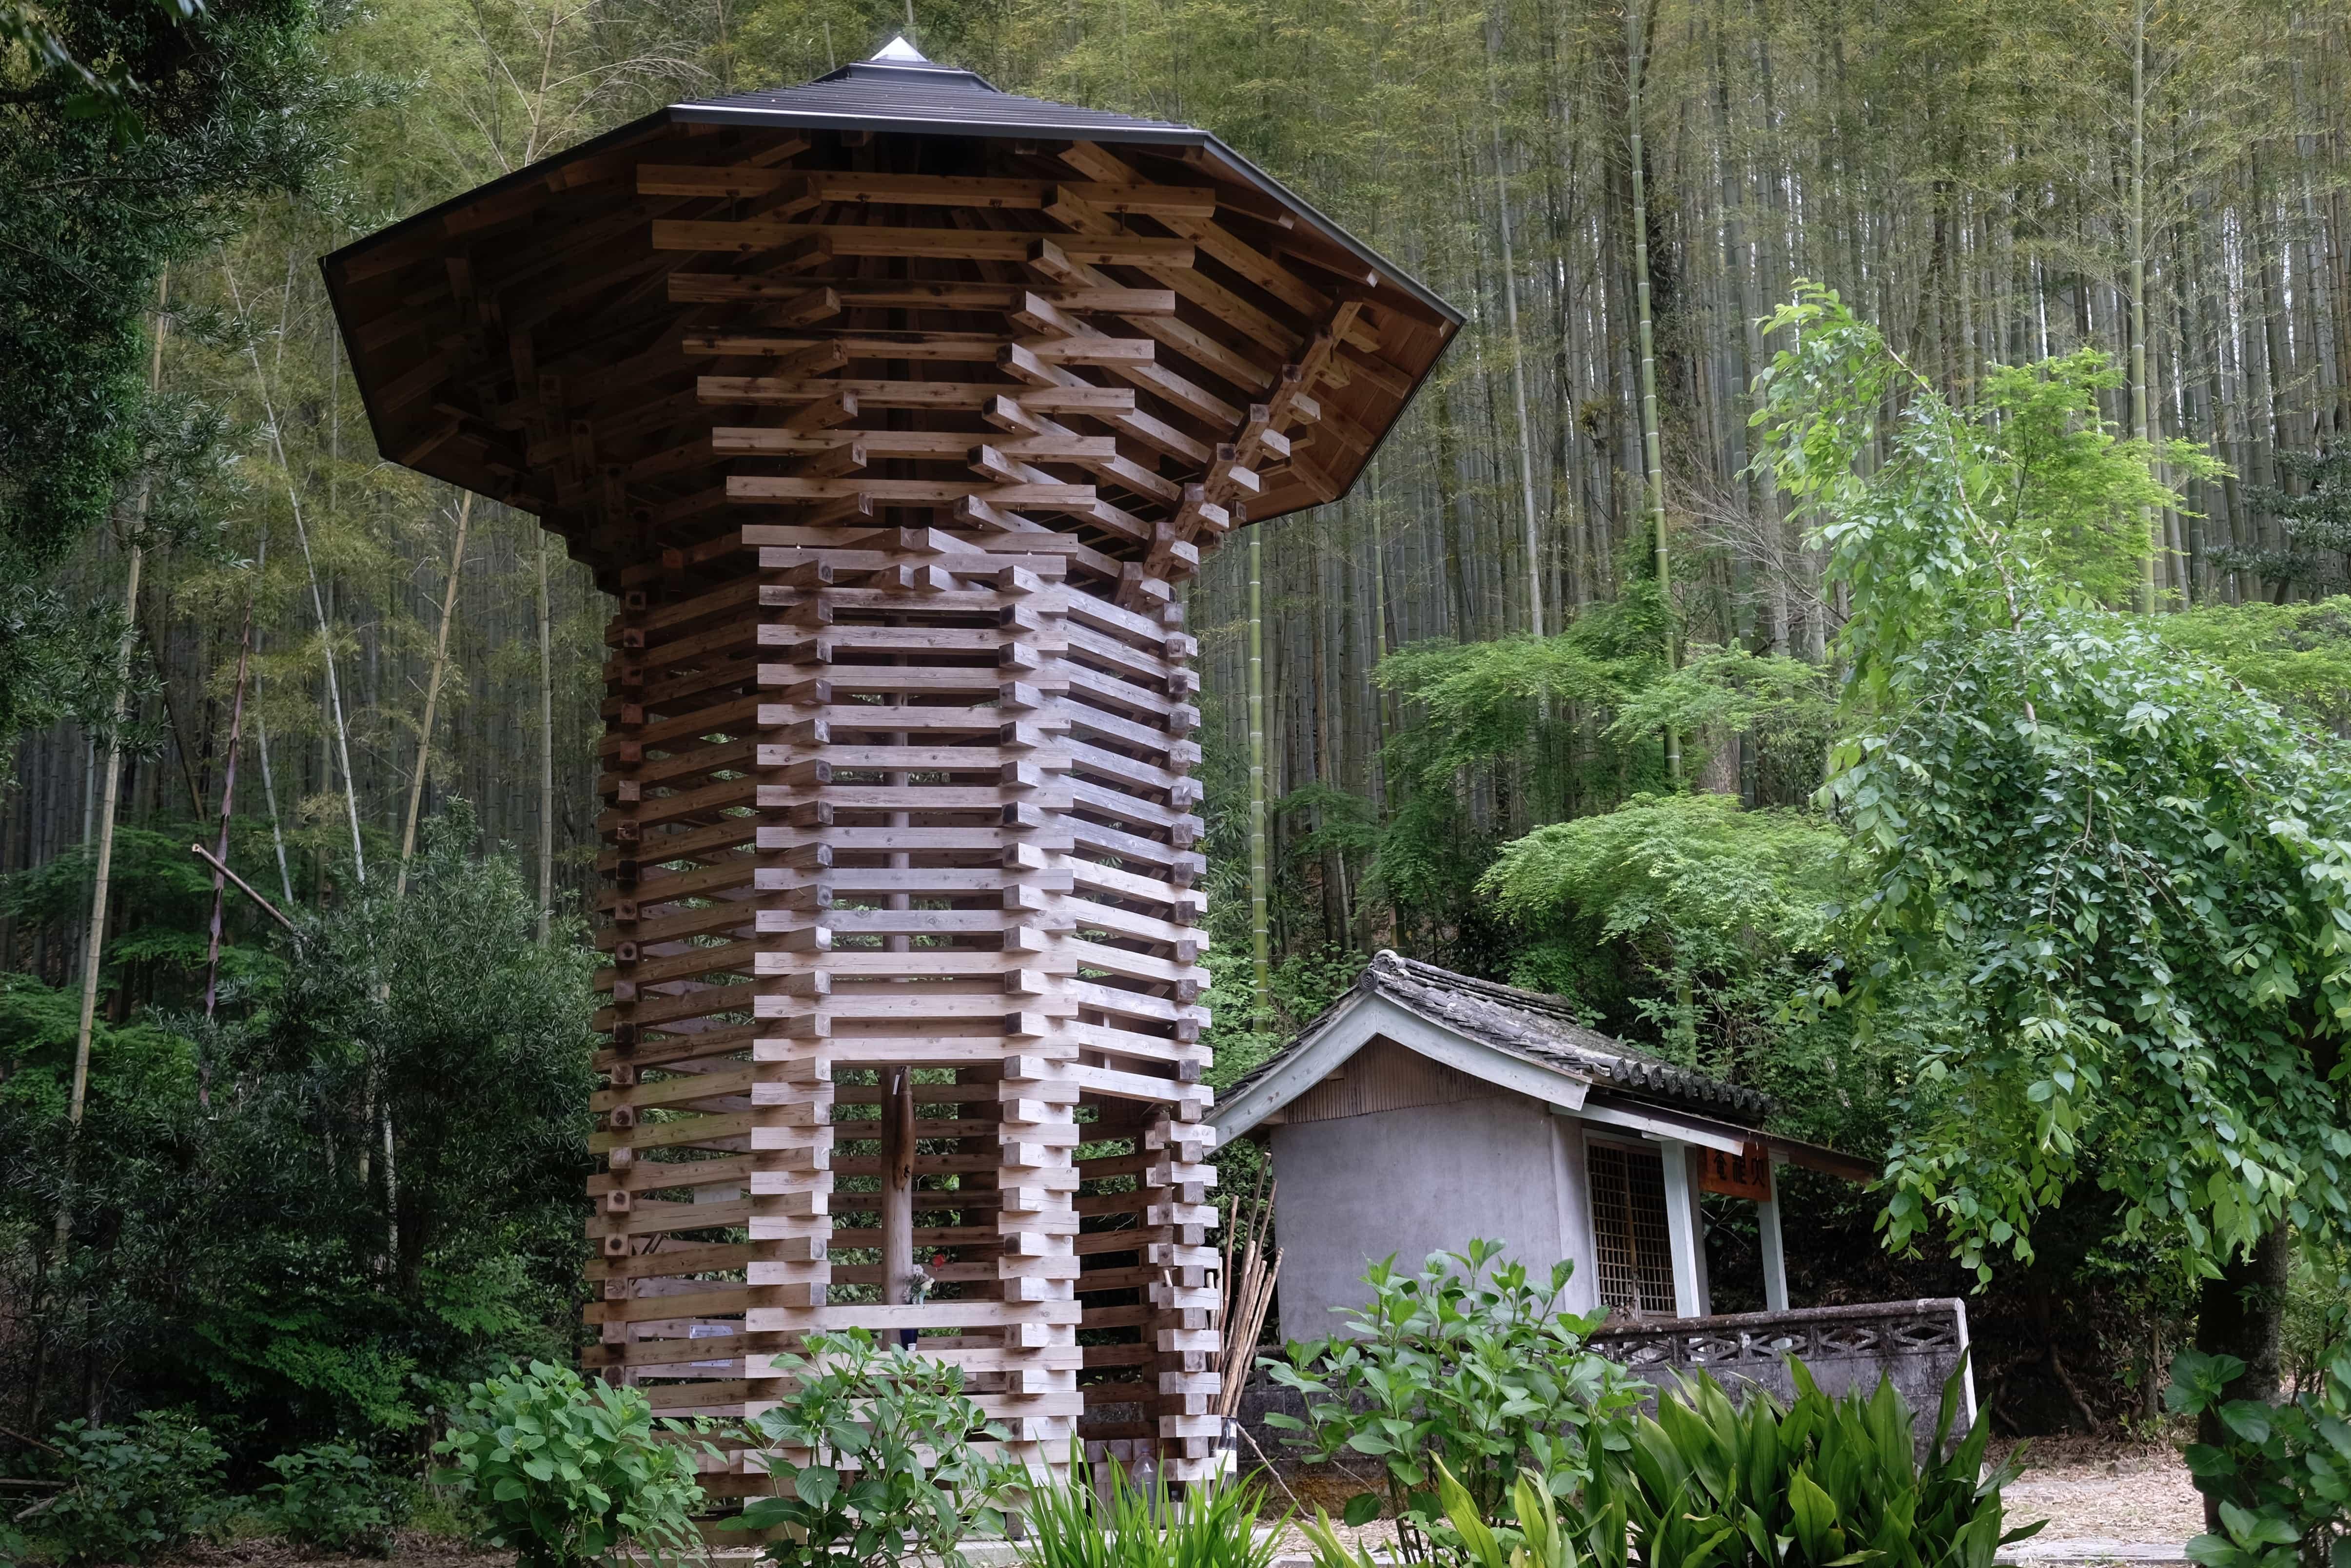 Wooden henro hut